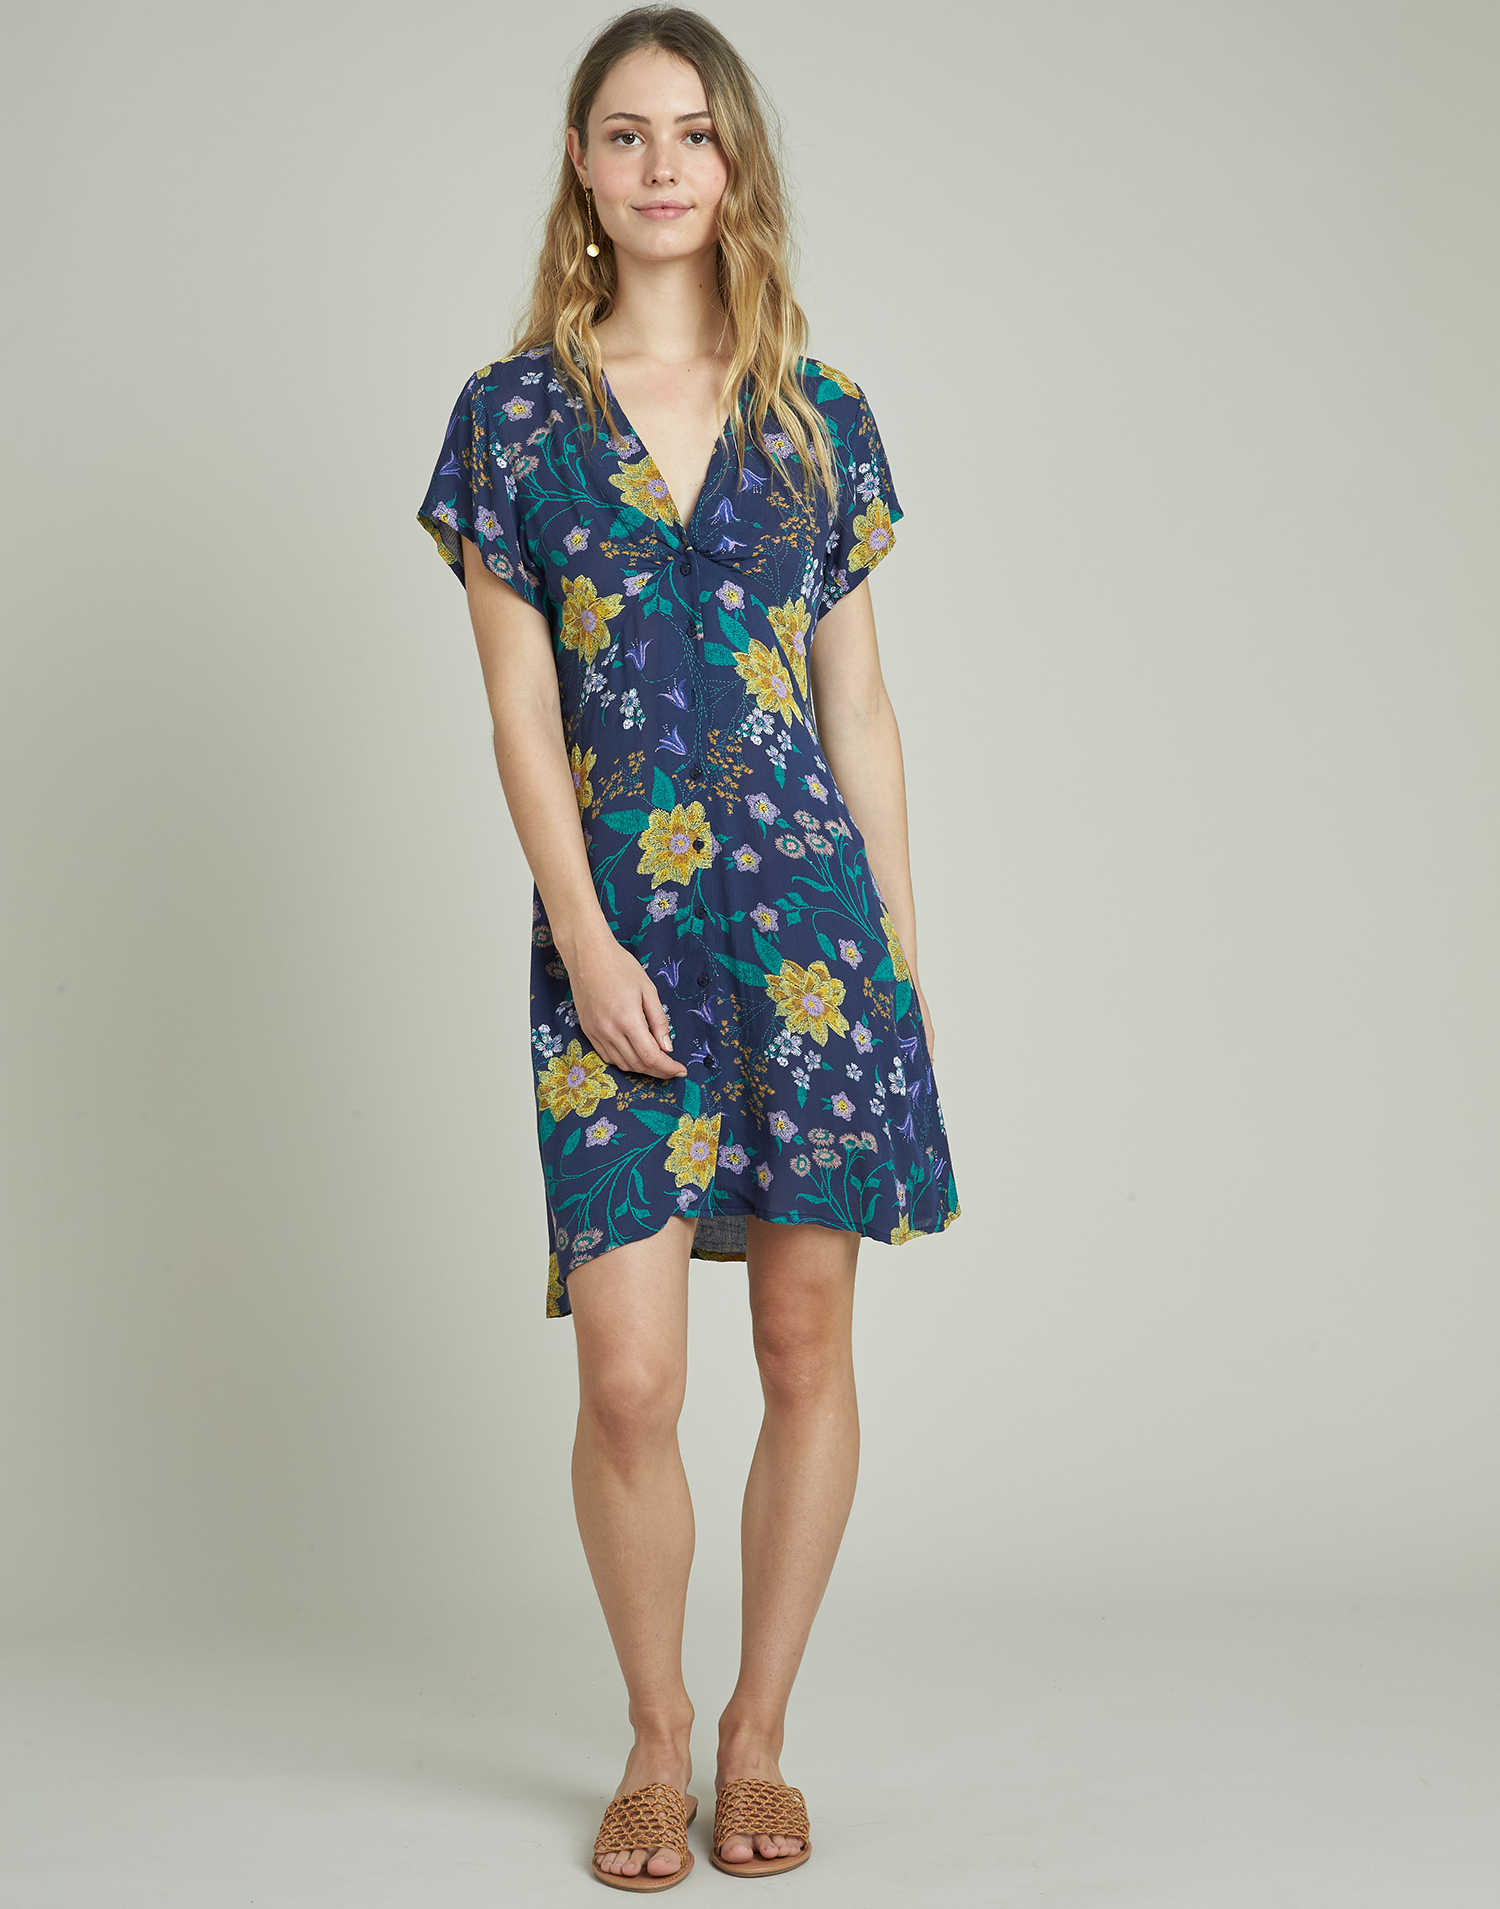 Flowered short printed dress